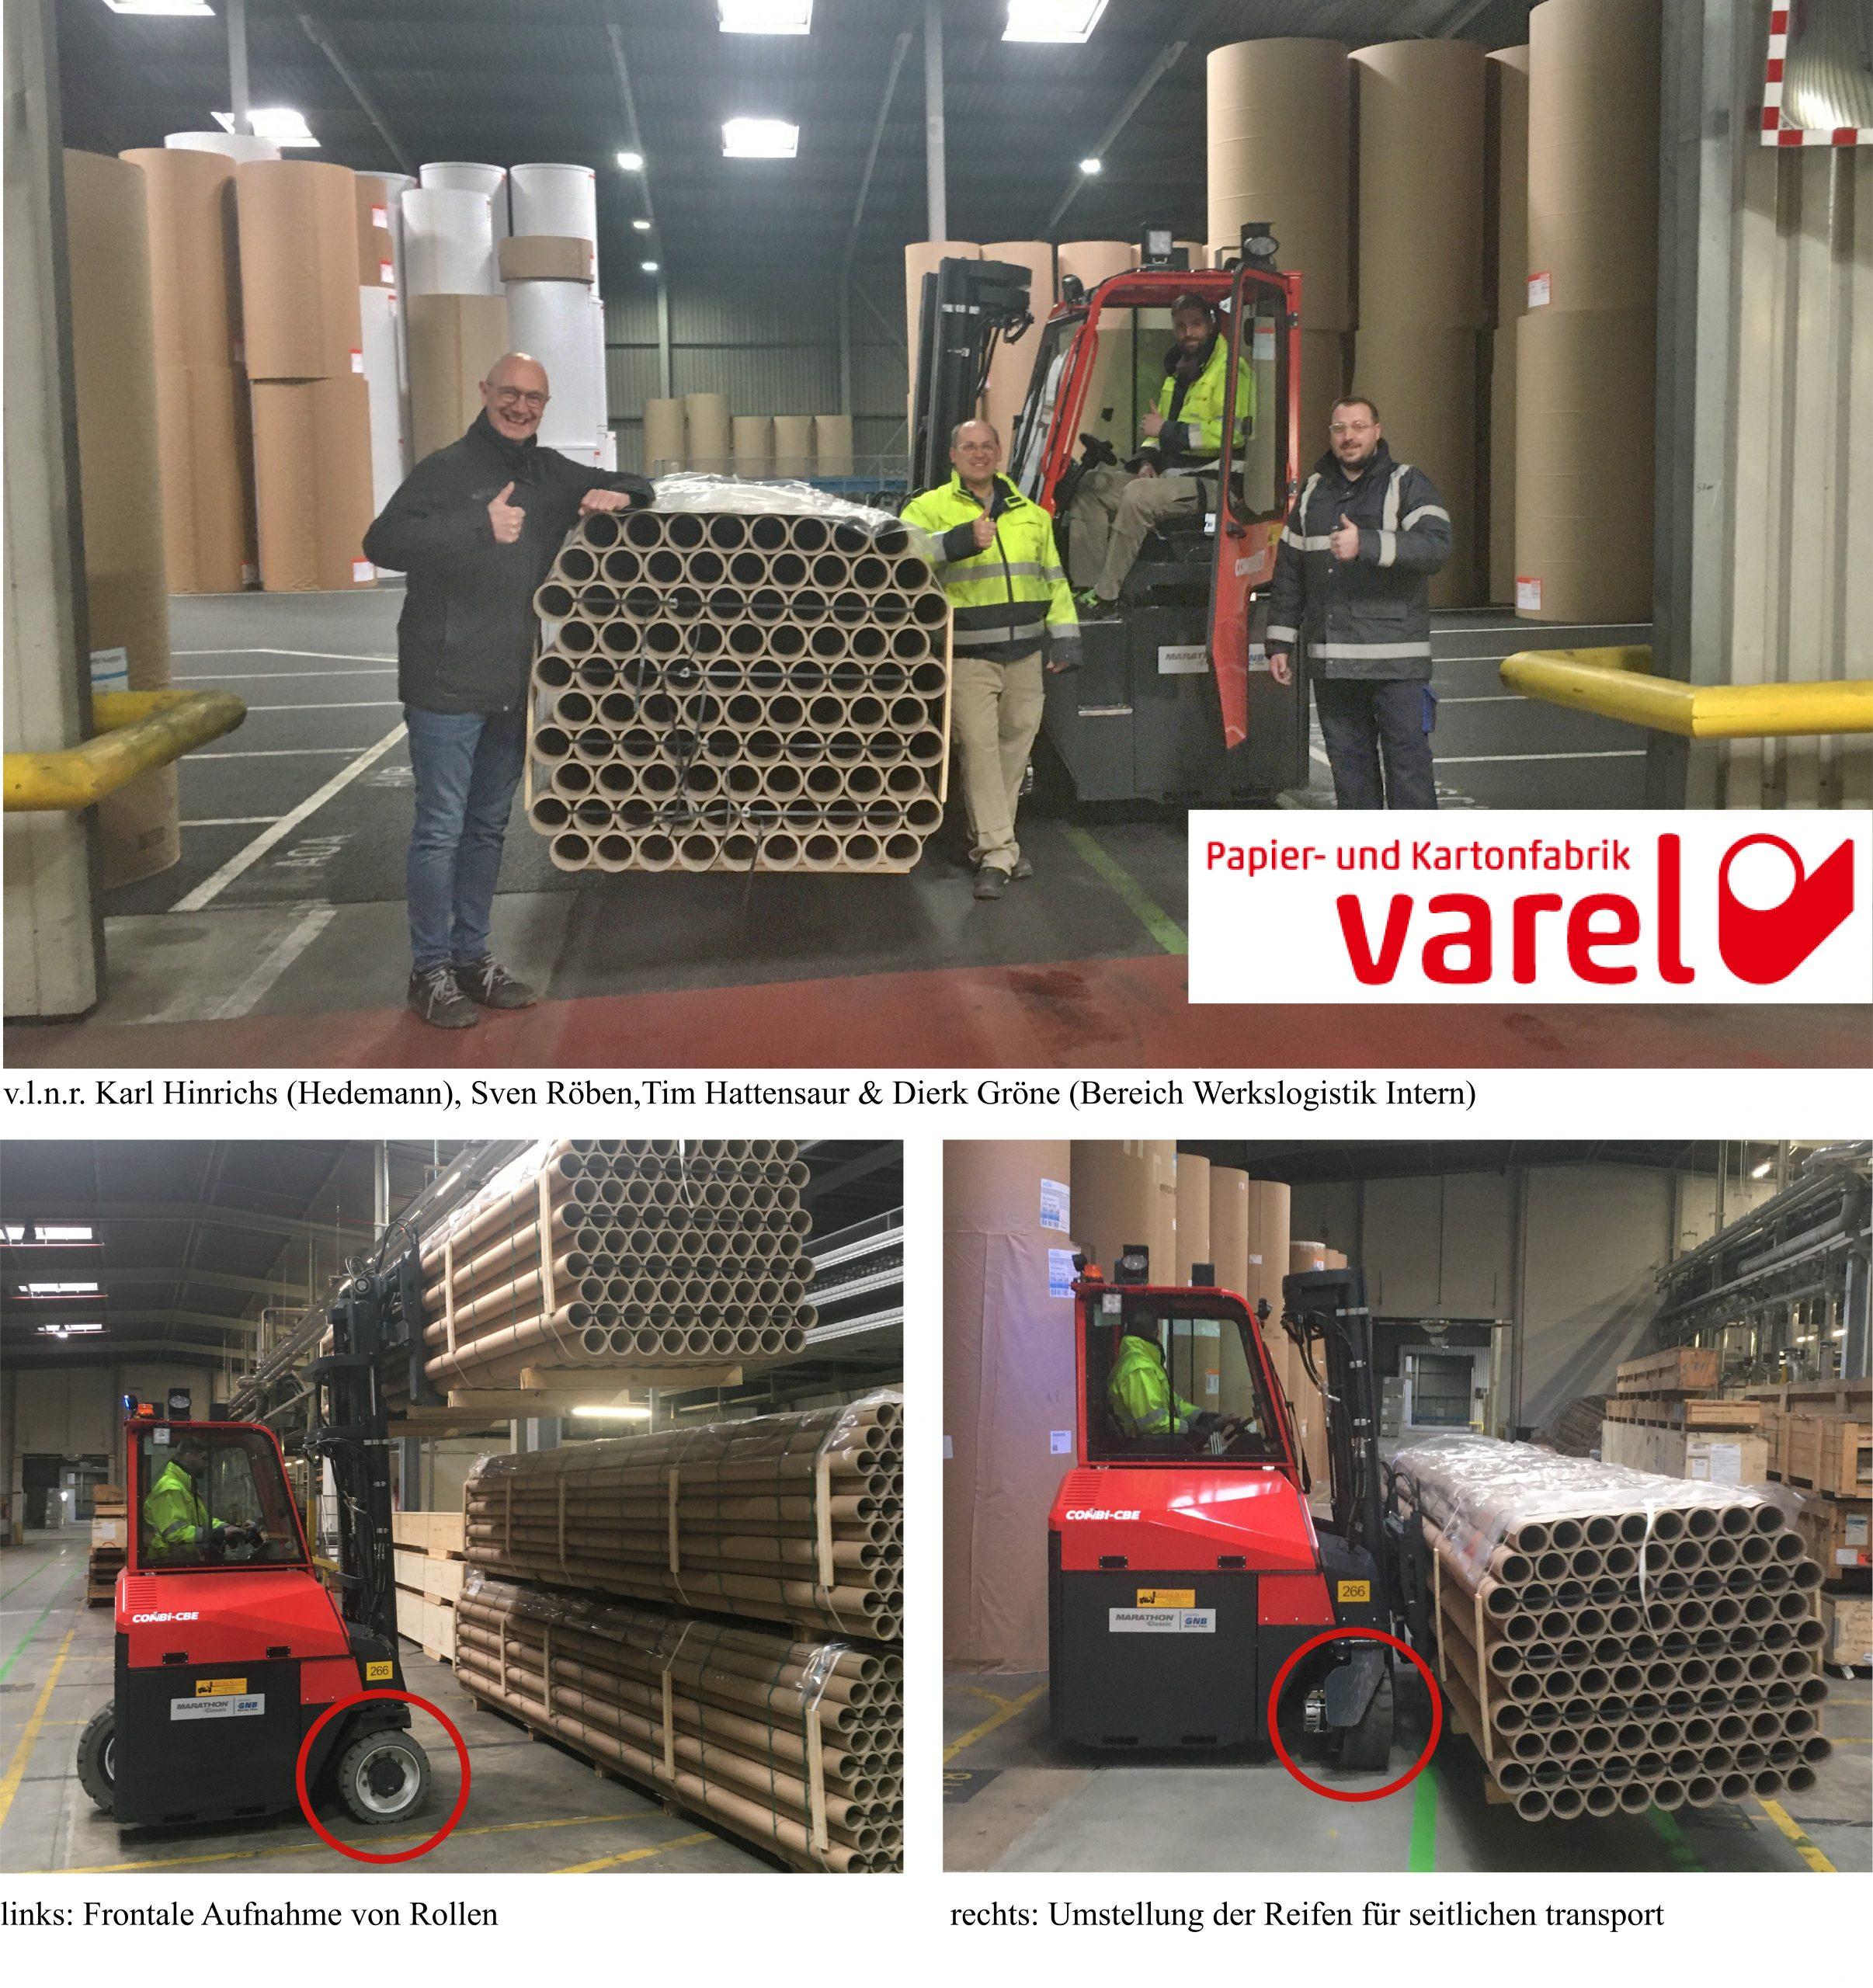 PK Varel – Über vier Wege Zeit sparen?